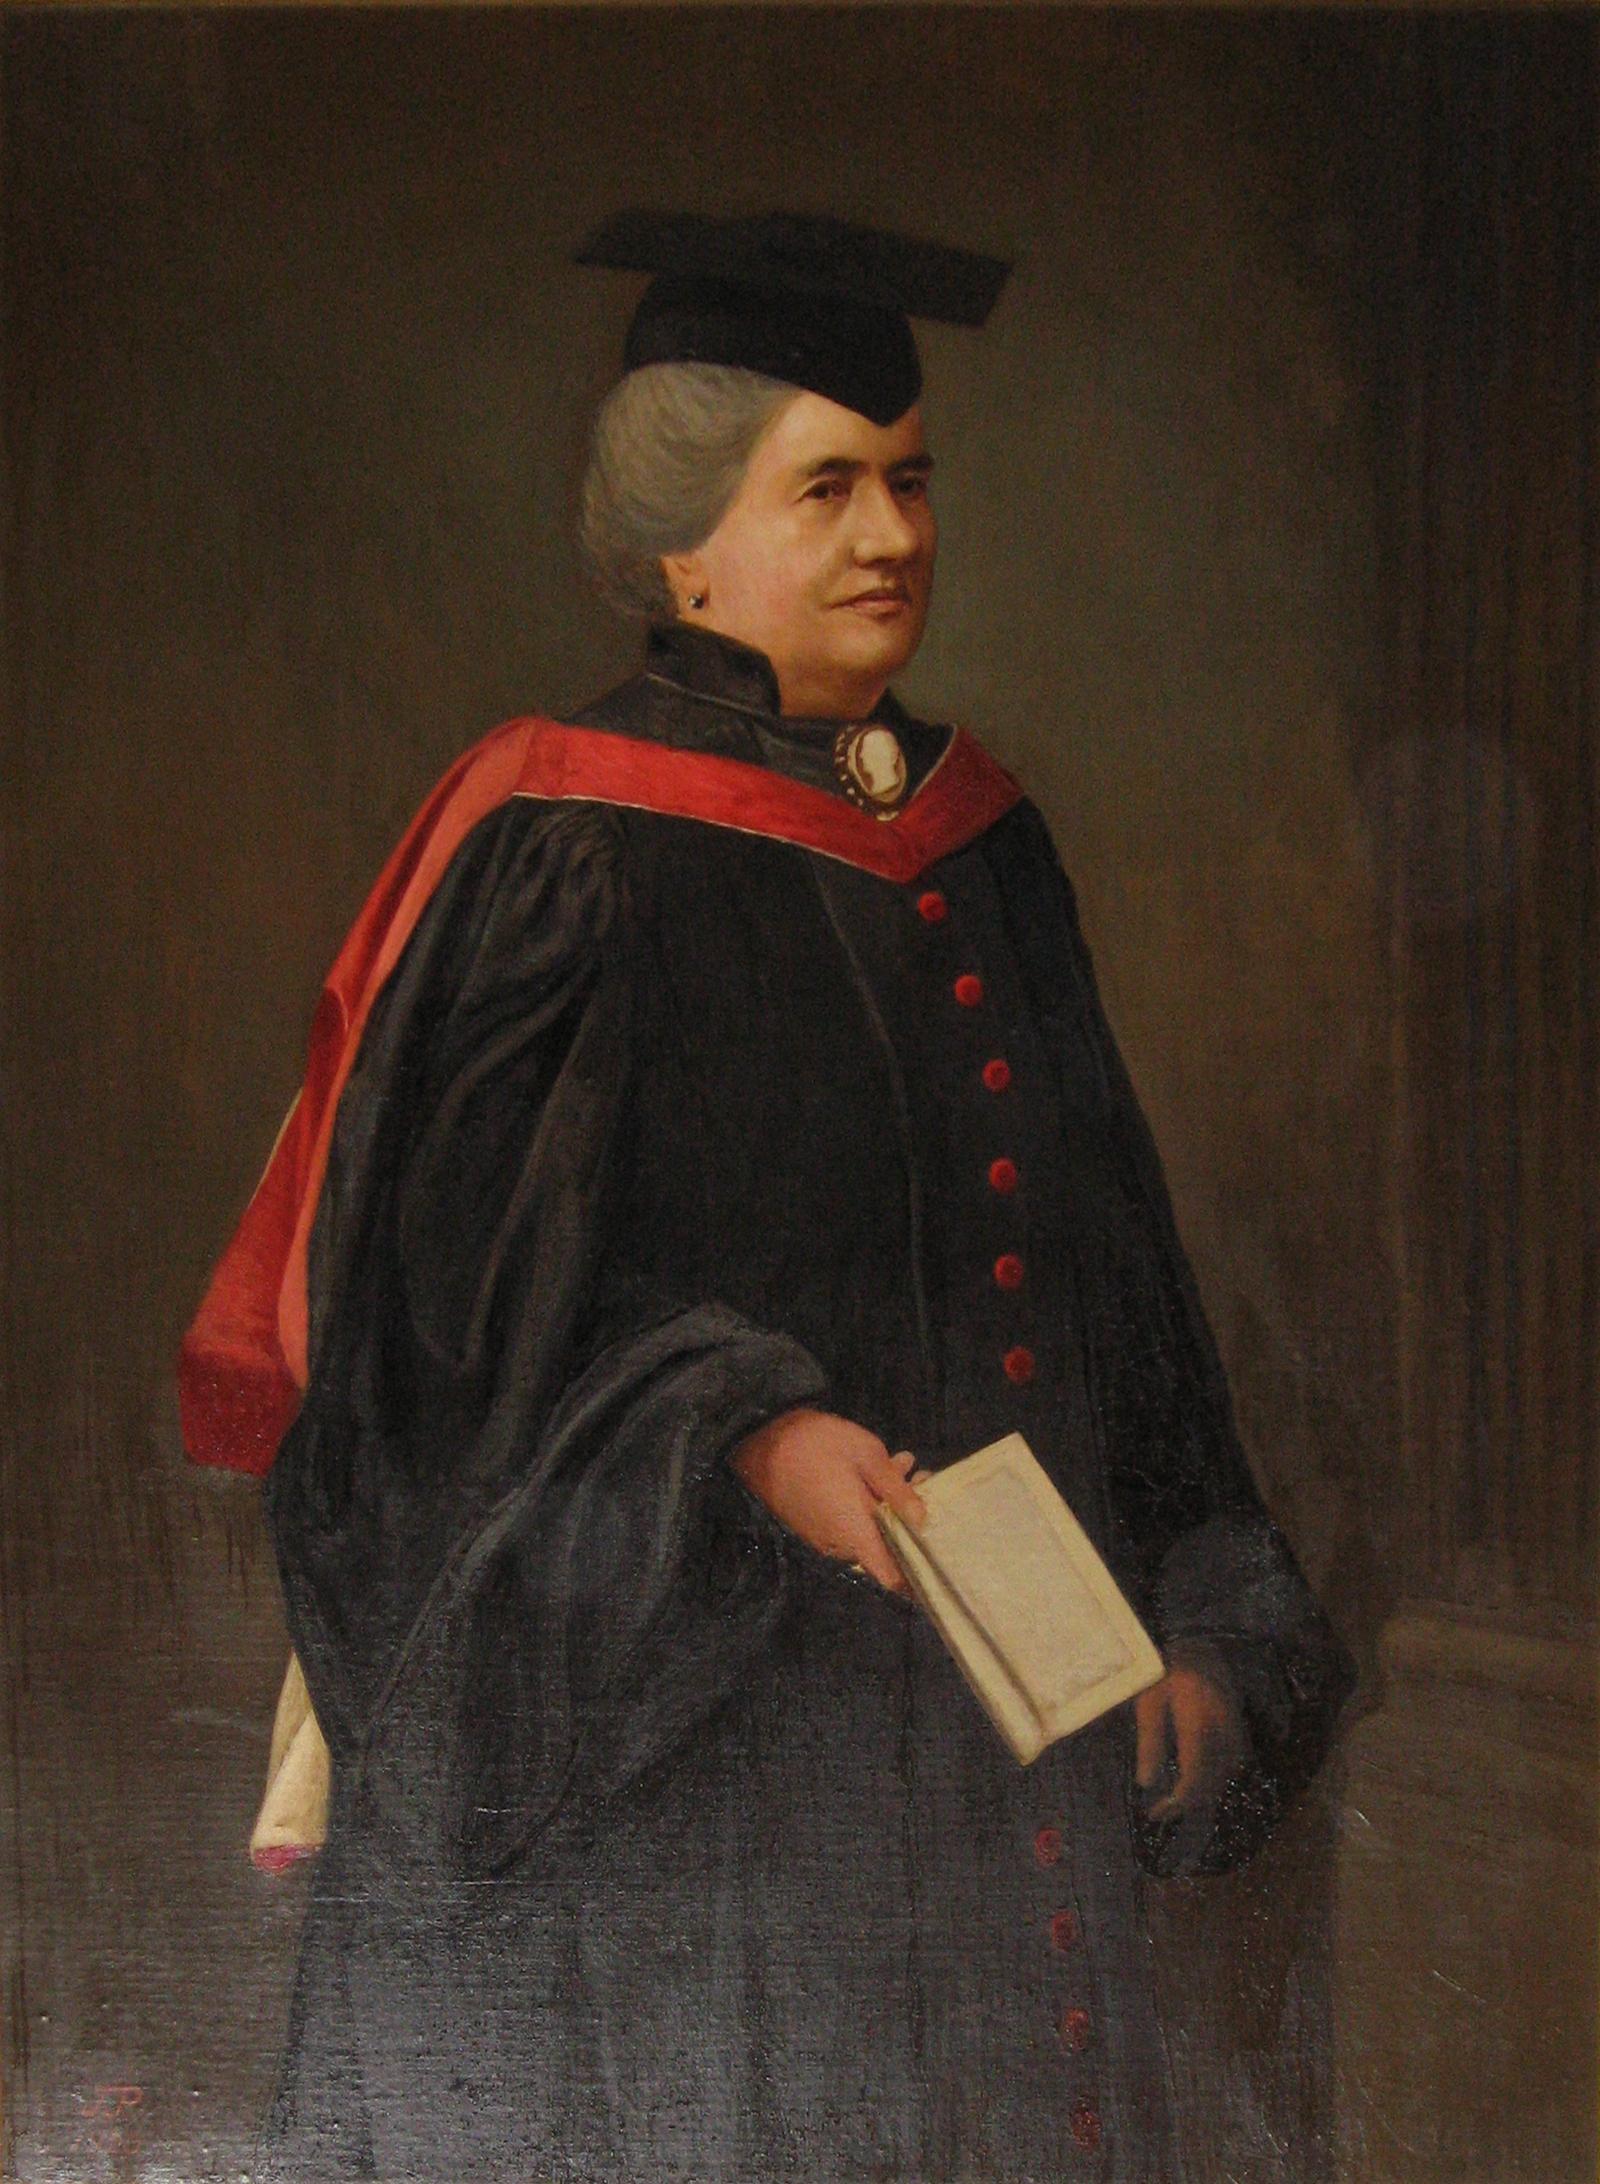 http://upload.wikimedia.org/wikipedia/commons/b/b3/Agnes_Smith_Lewis.jpg